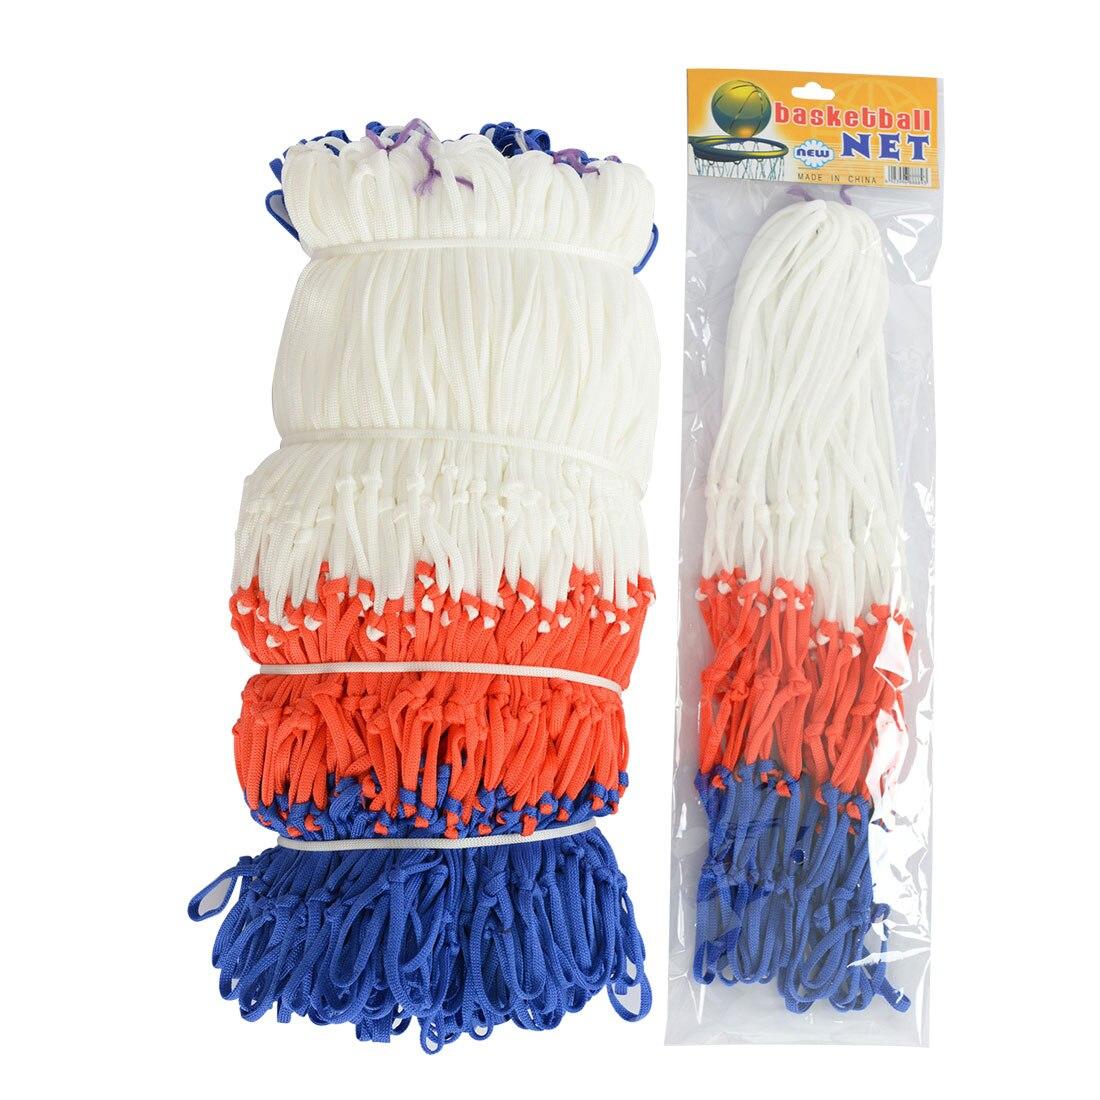 Standard Nylon Thread Sports Basketball Hoop Mesh Net Backboard Rim ...